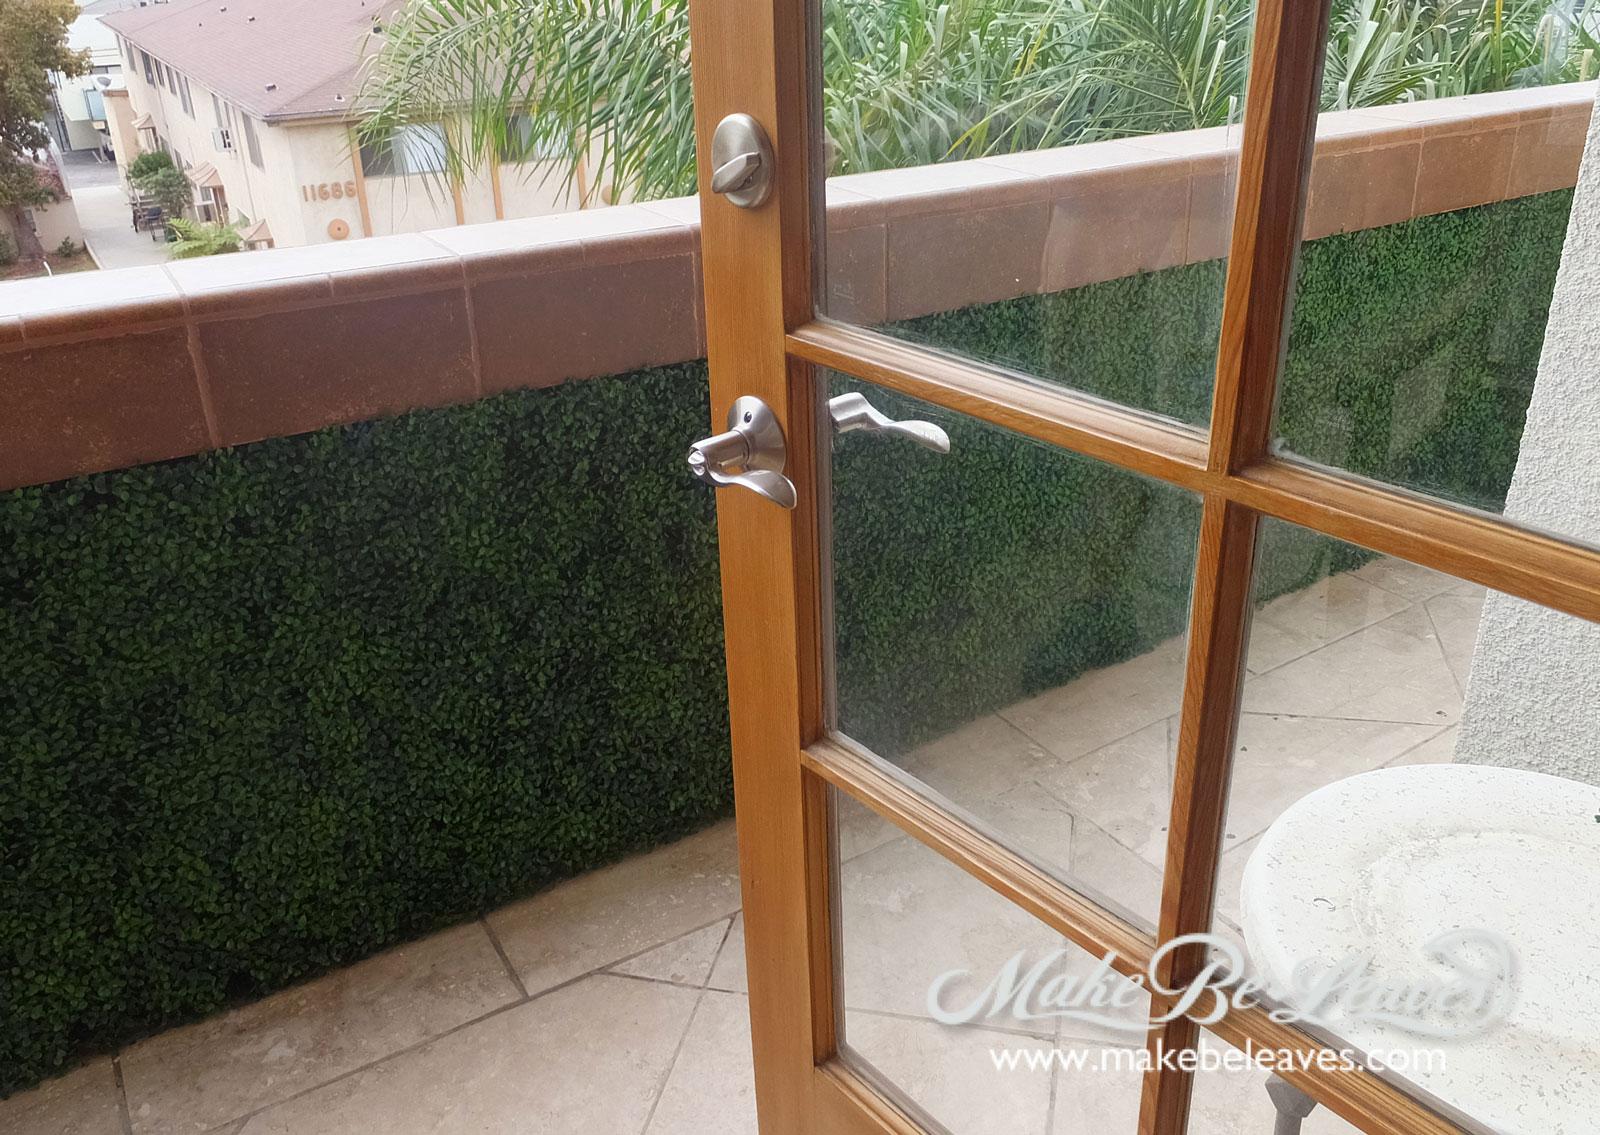 Make be-leaves UV_boxwood_balcony_wall1